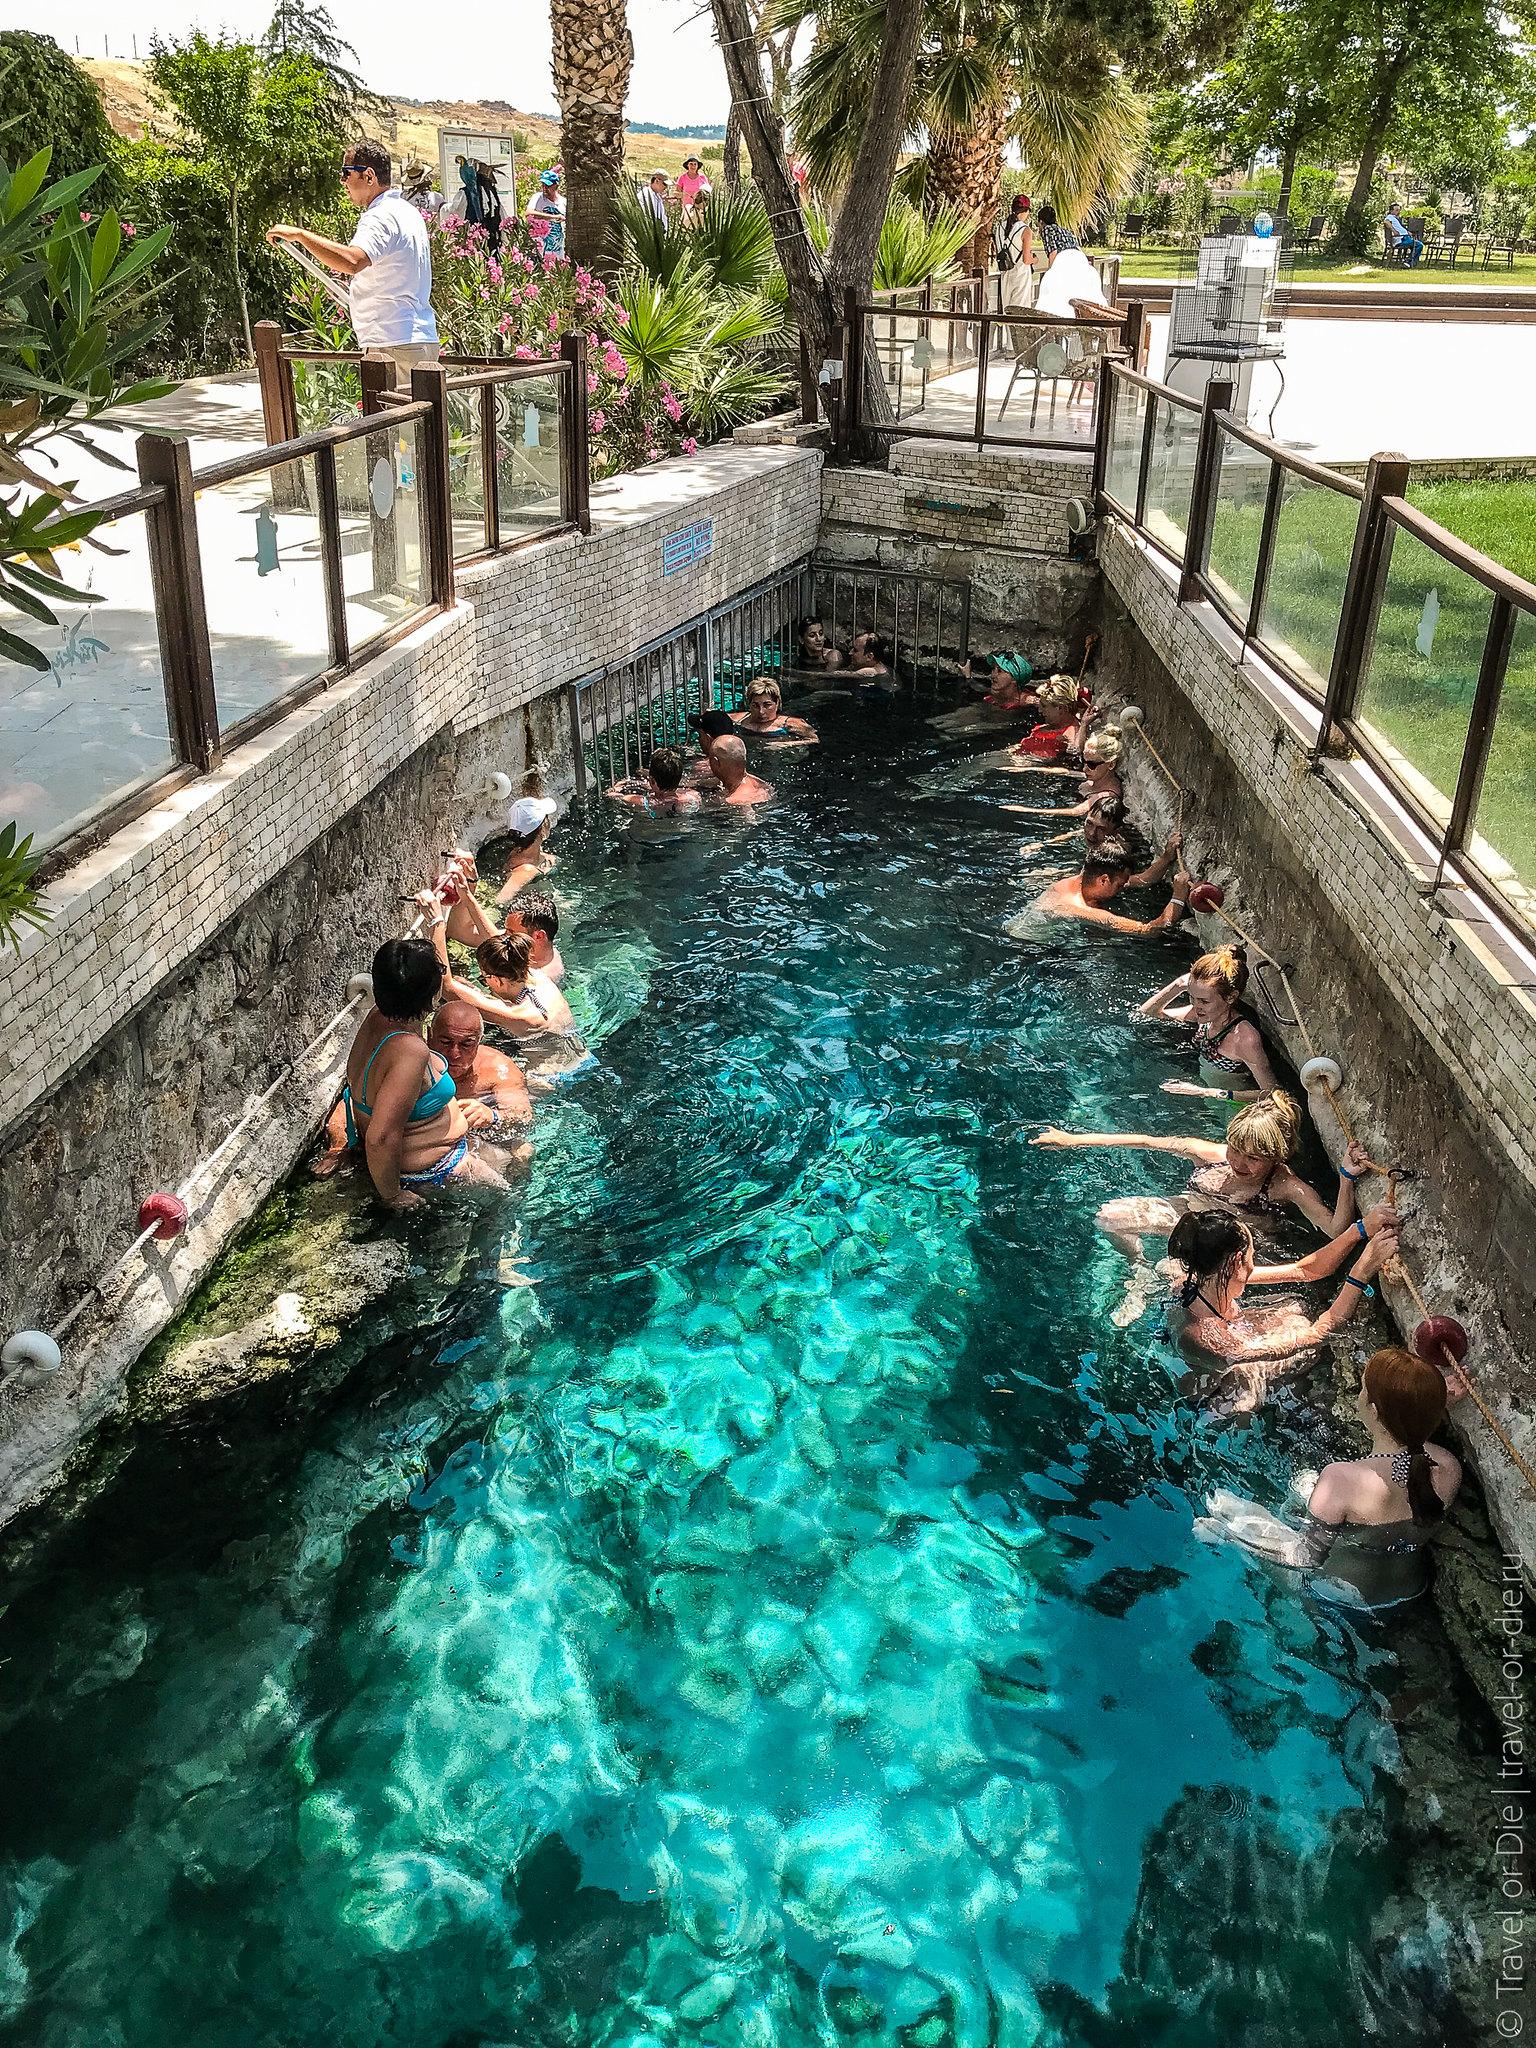 Cleopatra-Pools-Turkey-7398